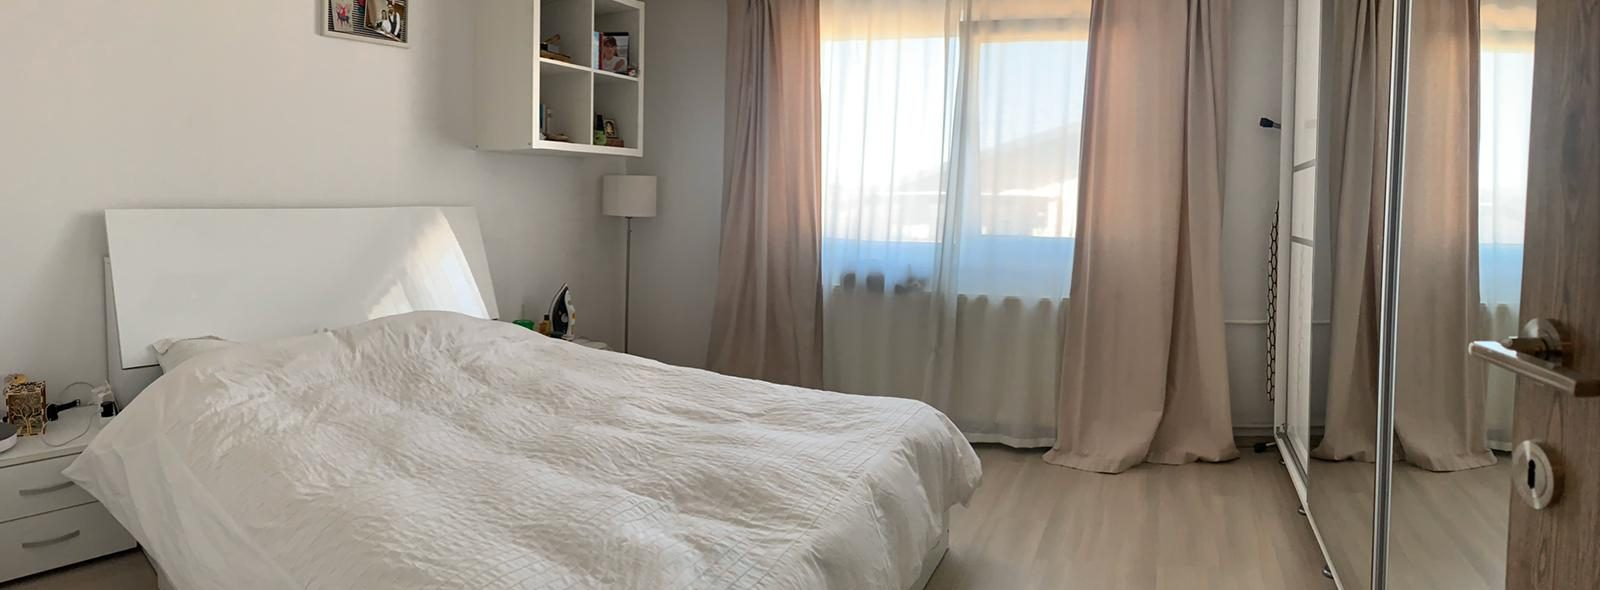 Vanzare Apartament 2 camere Bucuresti, Lacul Tei poza principala